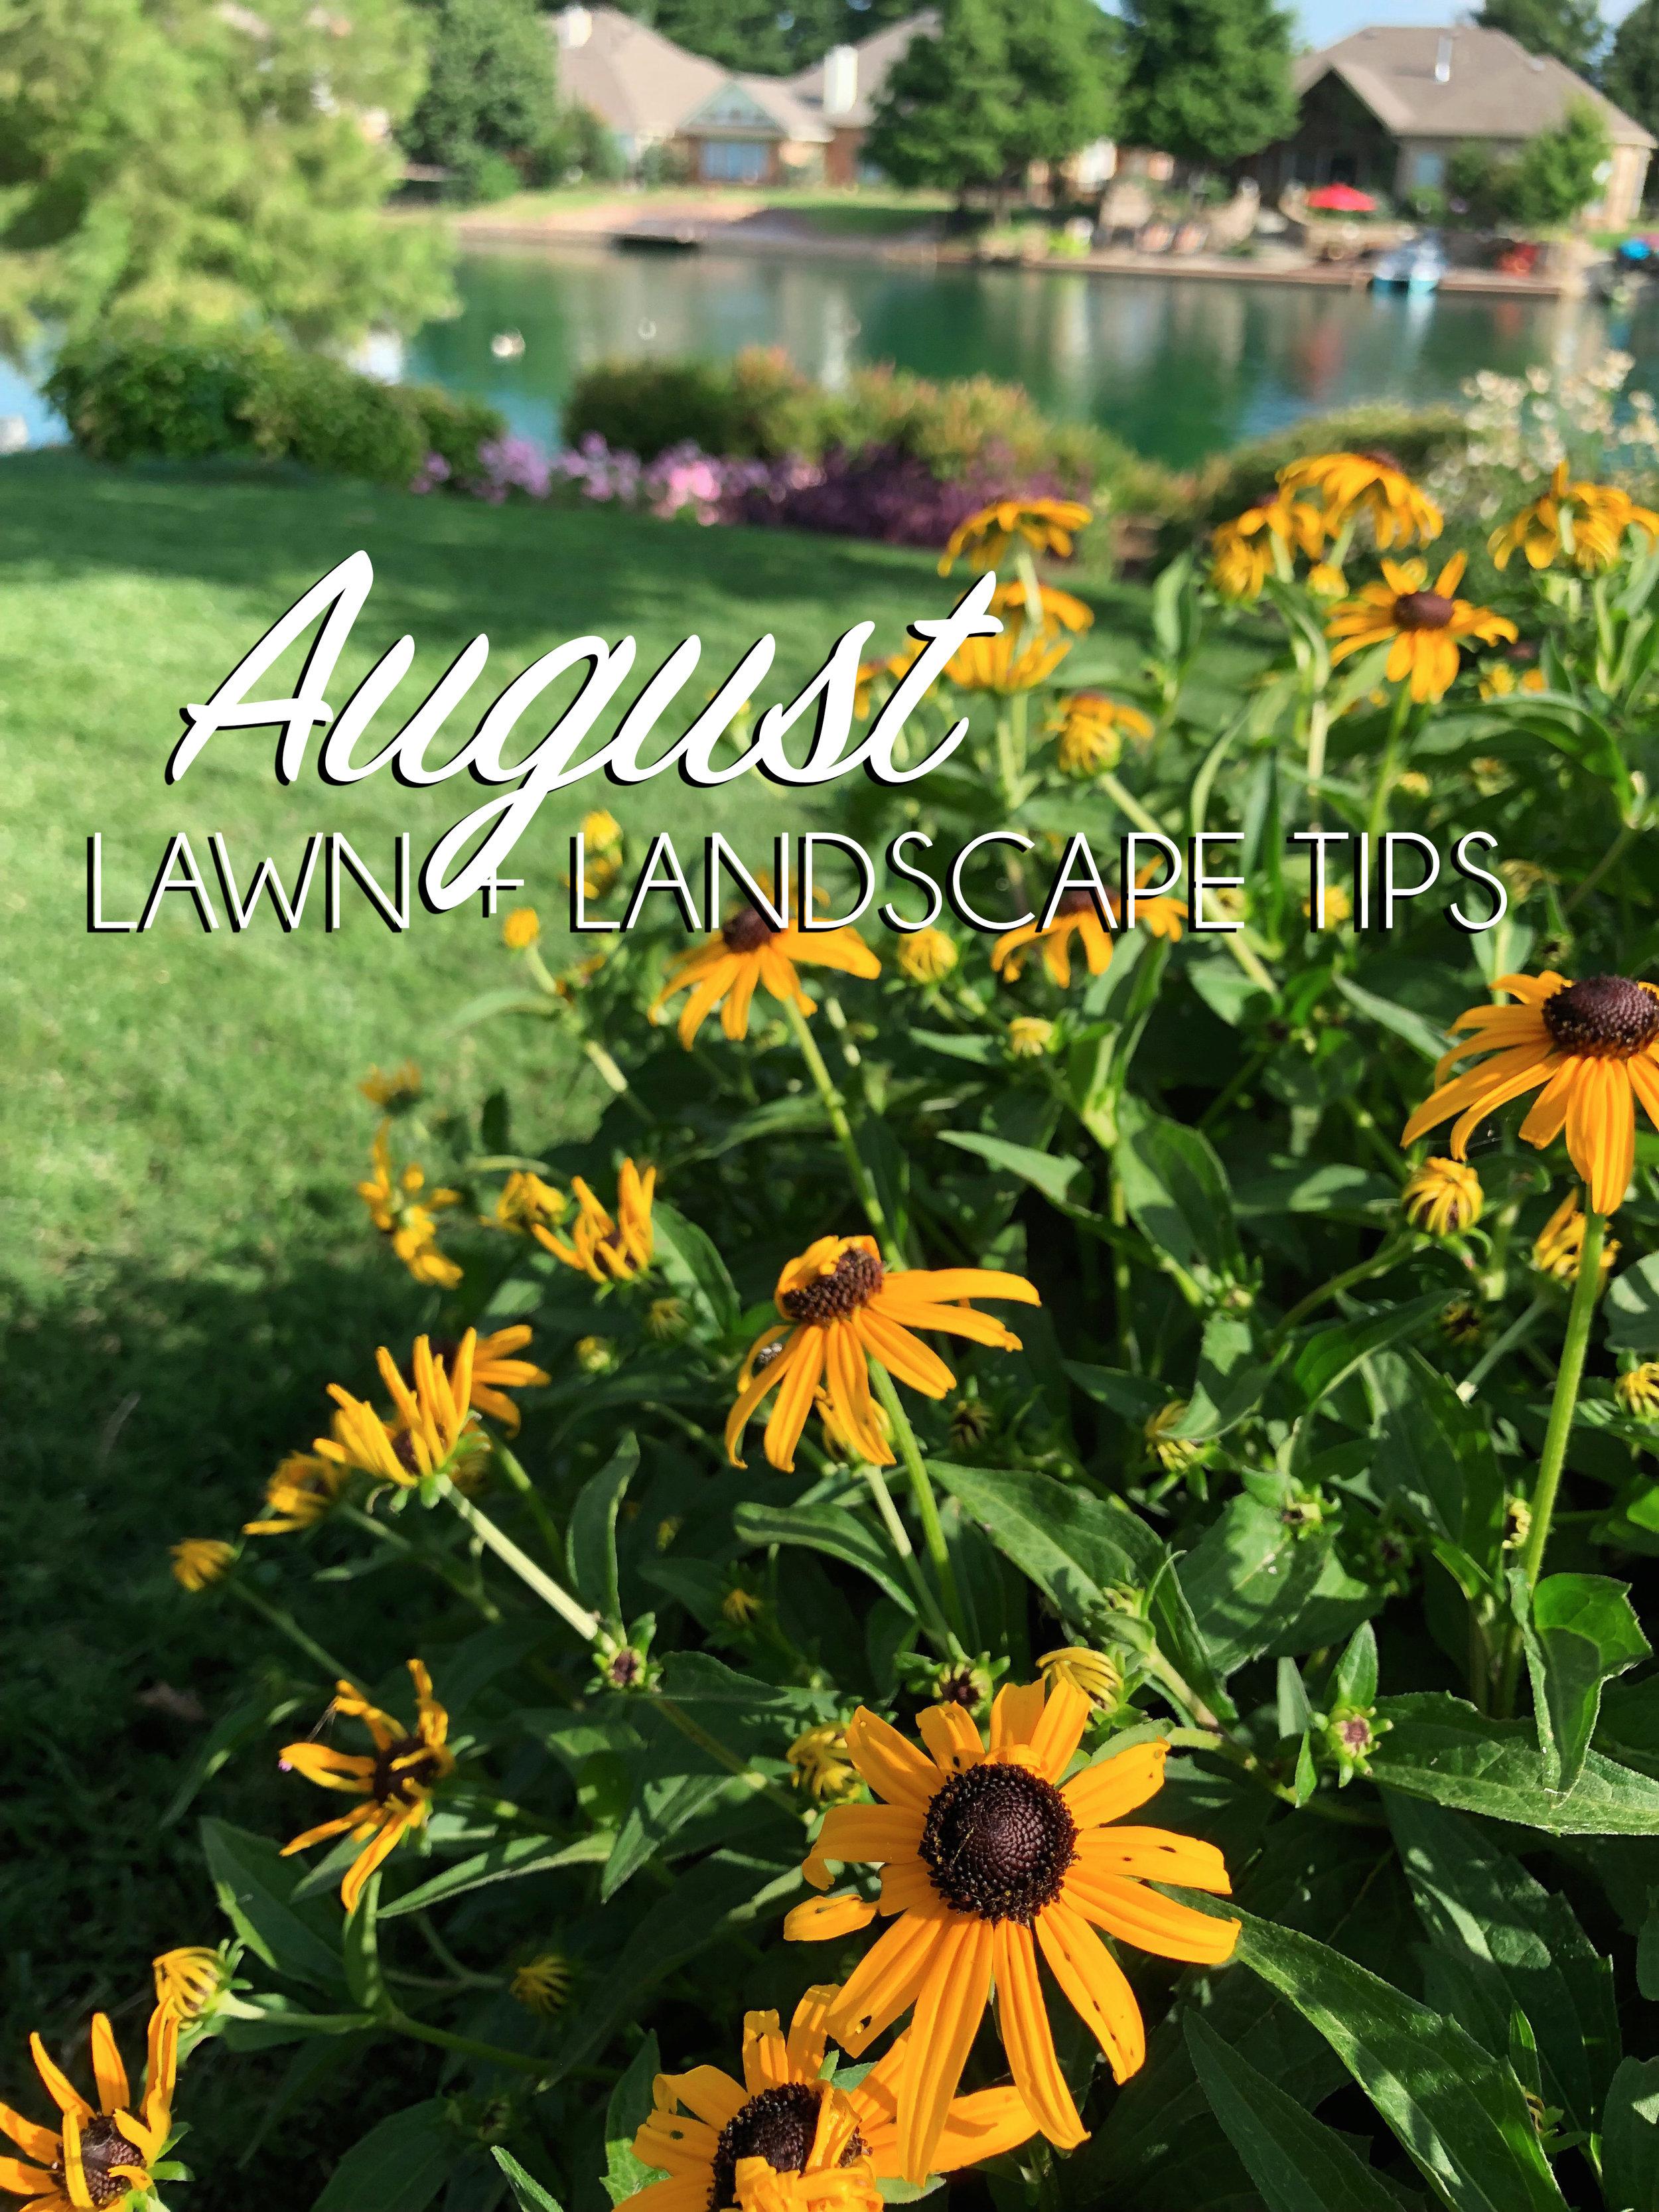 August Lawn & Landscape Tips.jpg